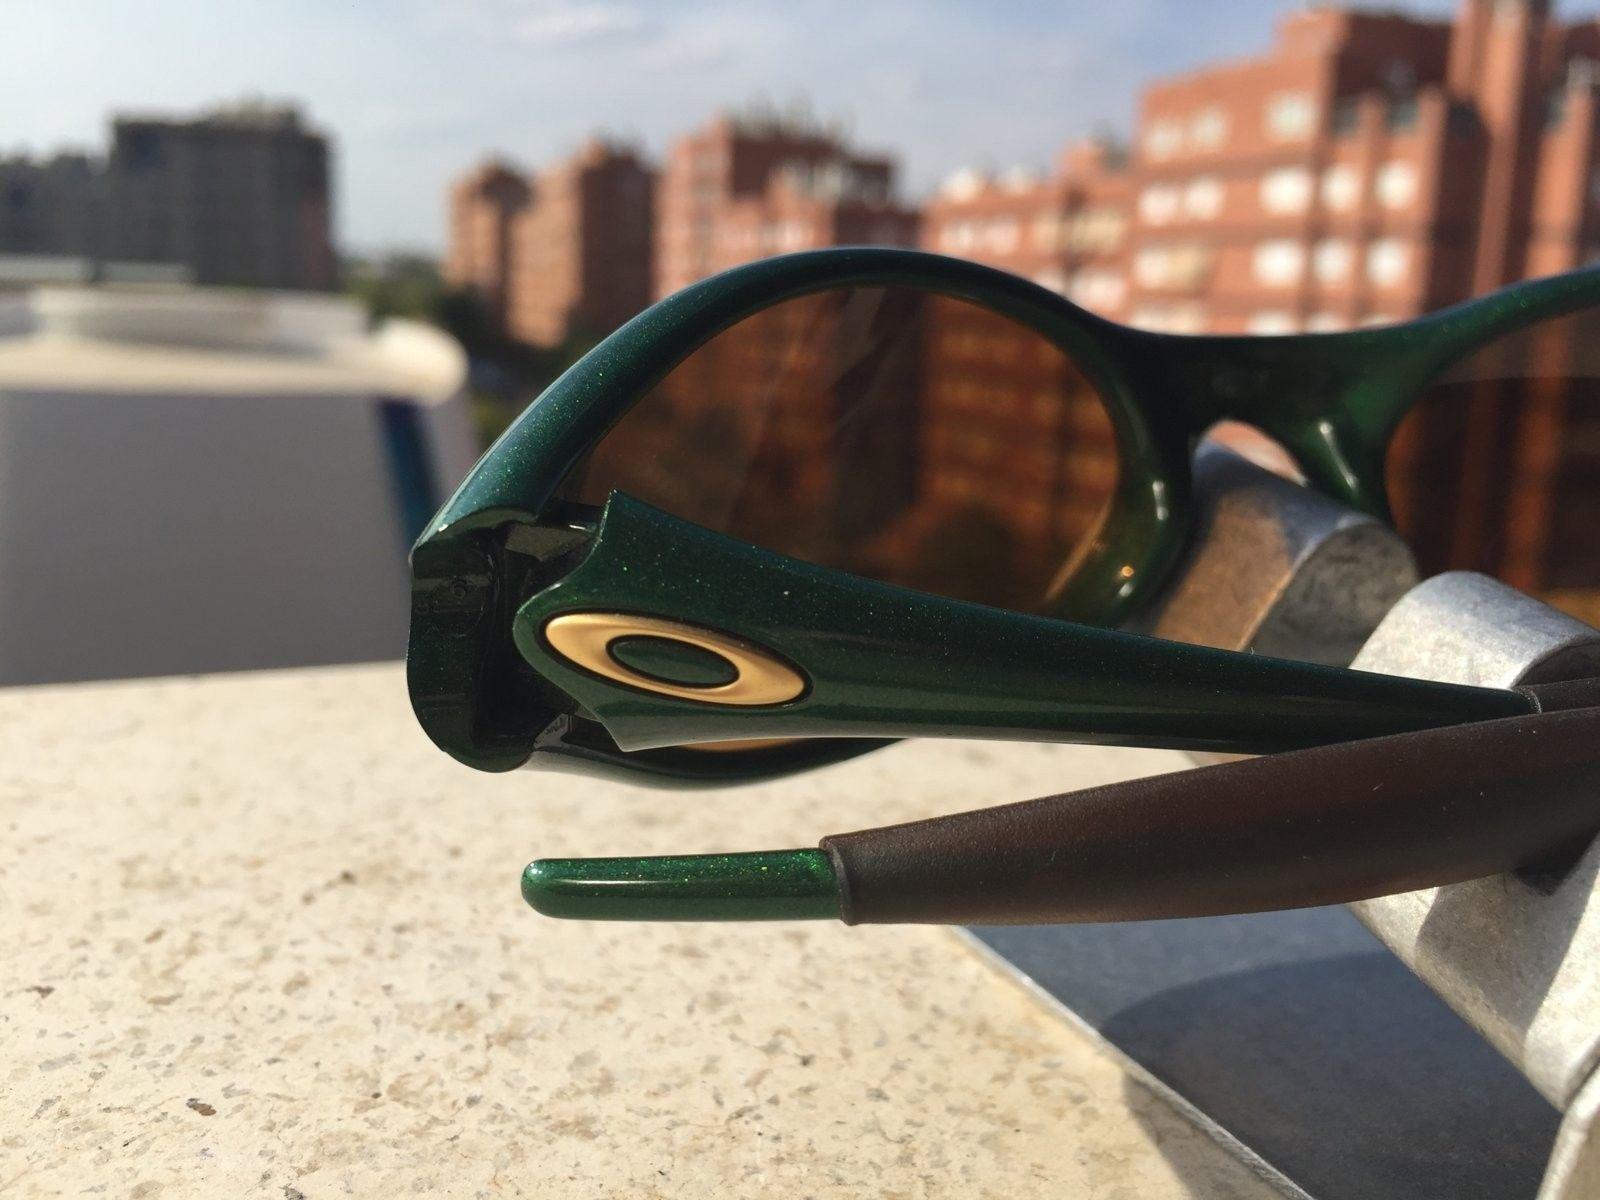 New Eye Jacket joker w/ gold iridium SKU: 04-311 + metal dispay #SOLD - image.jpeg